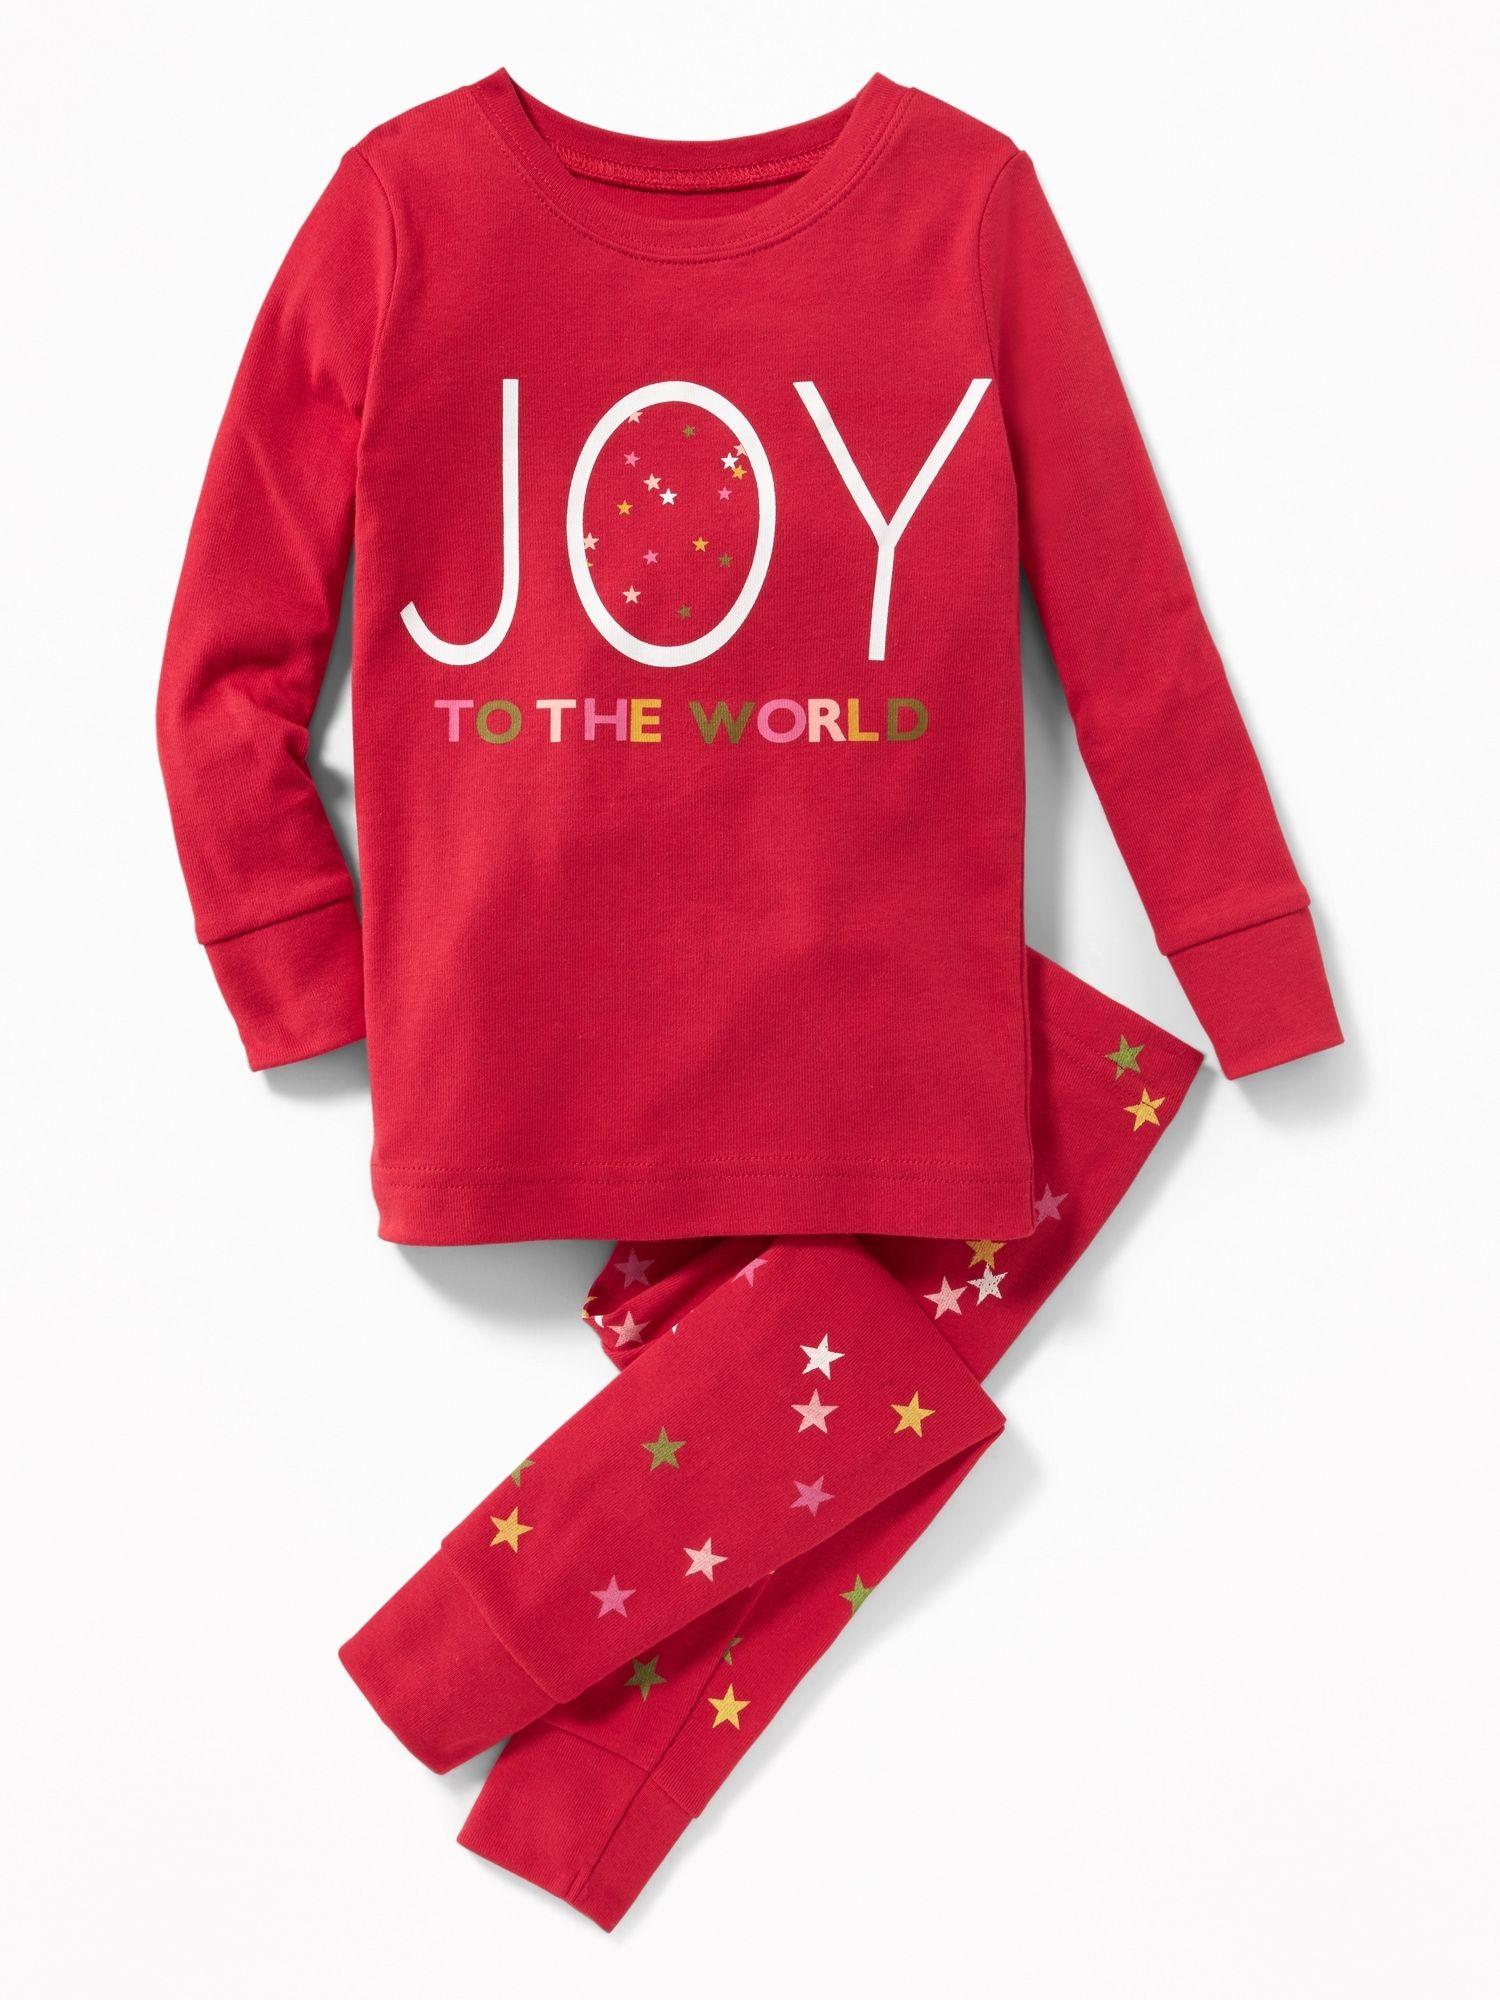 product photo Old navy christmas pajamas, Cute christmas